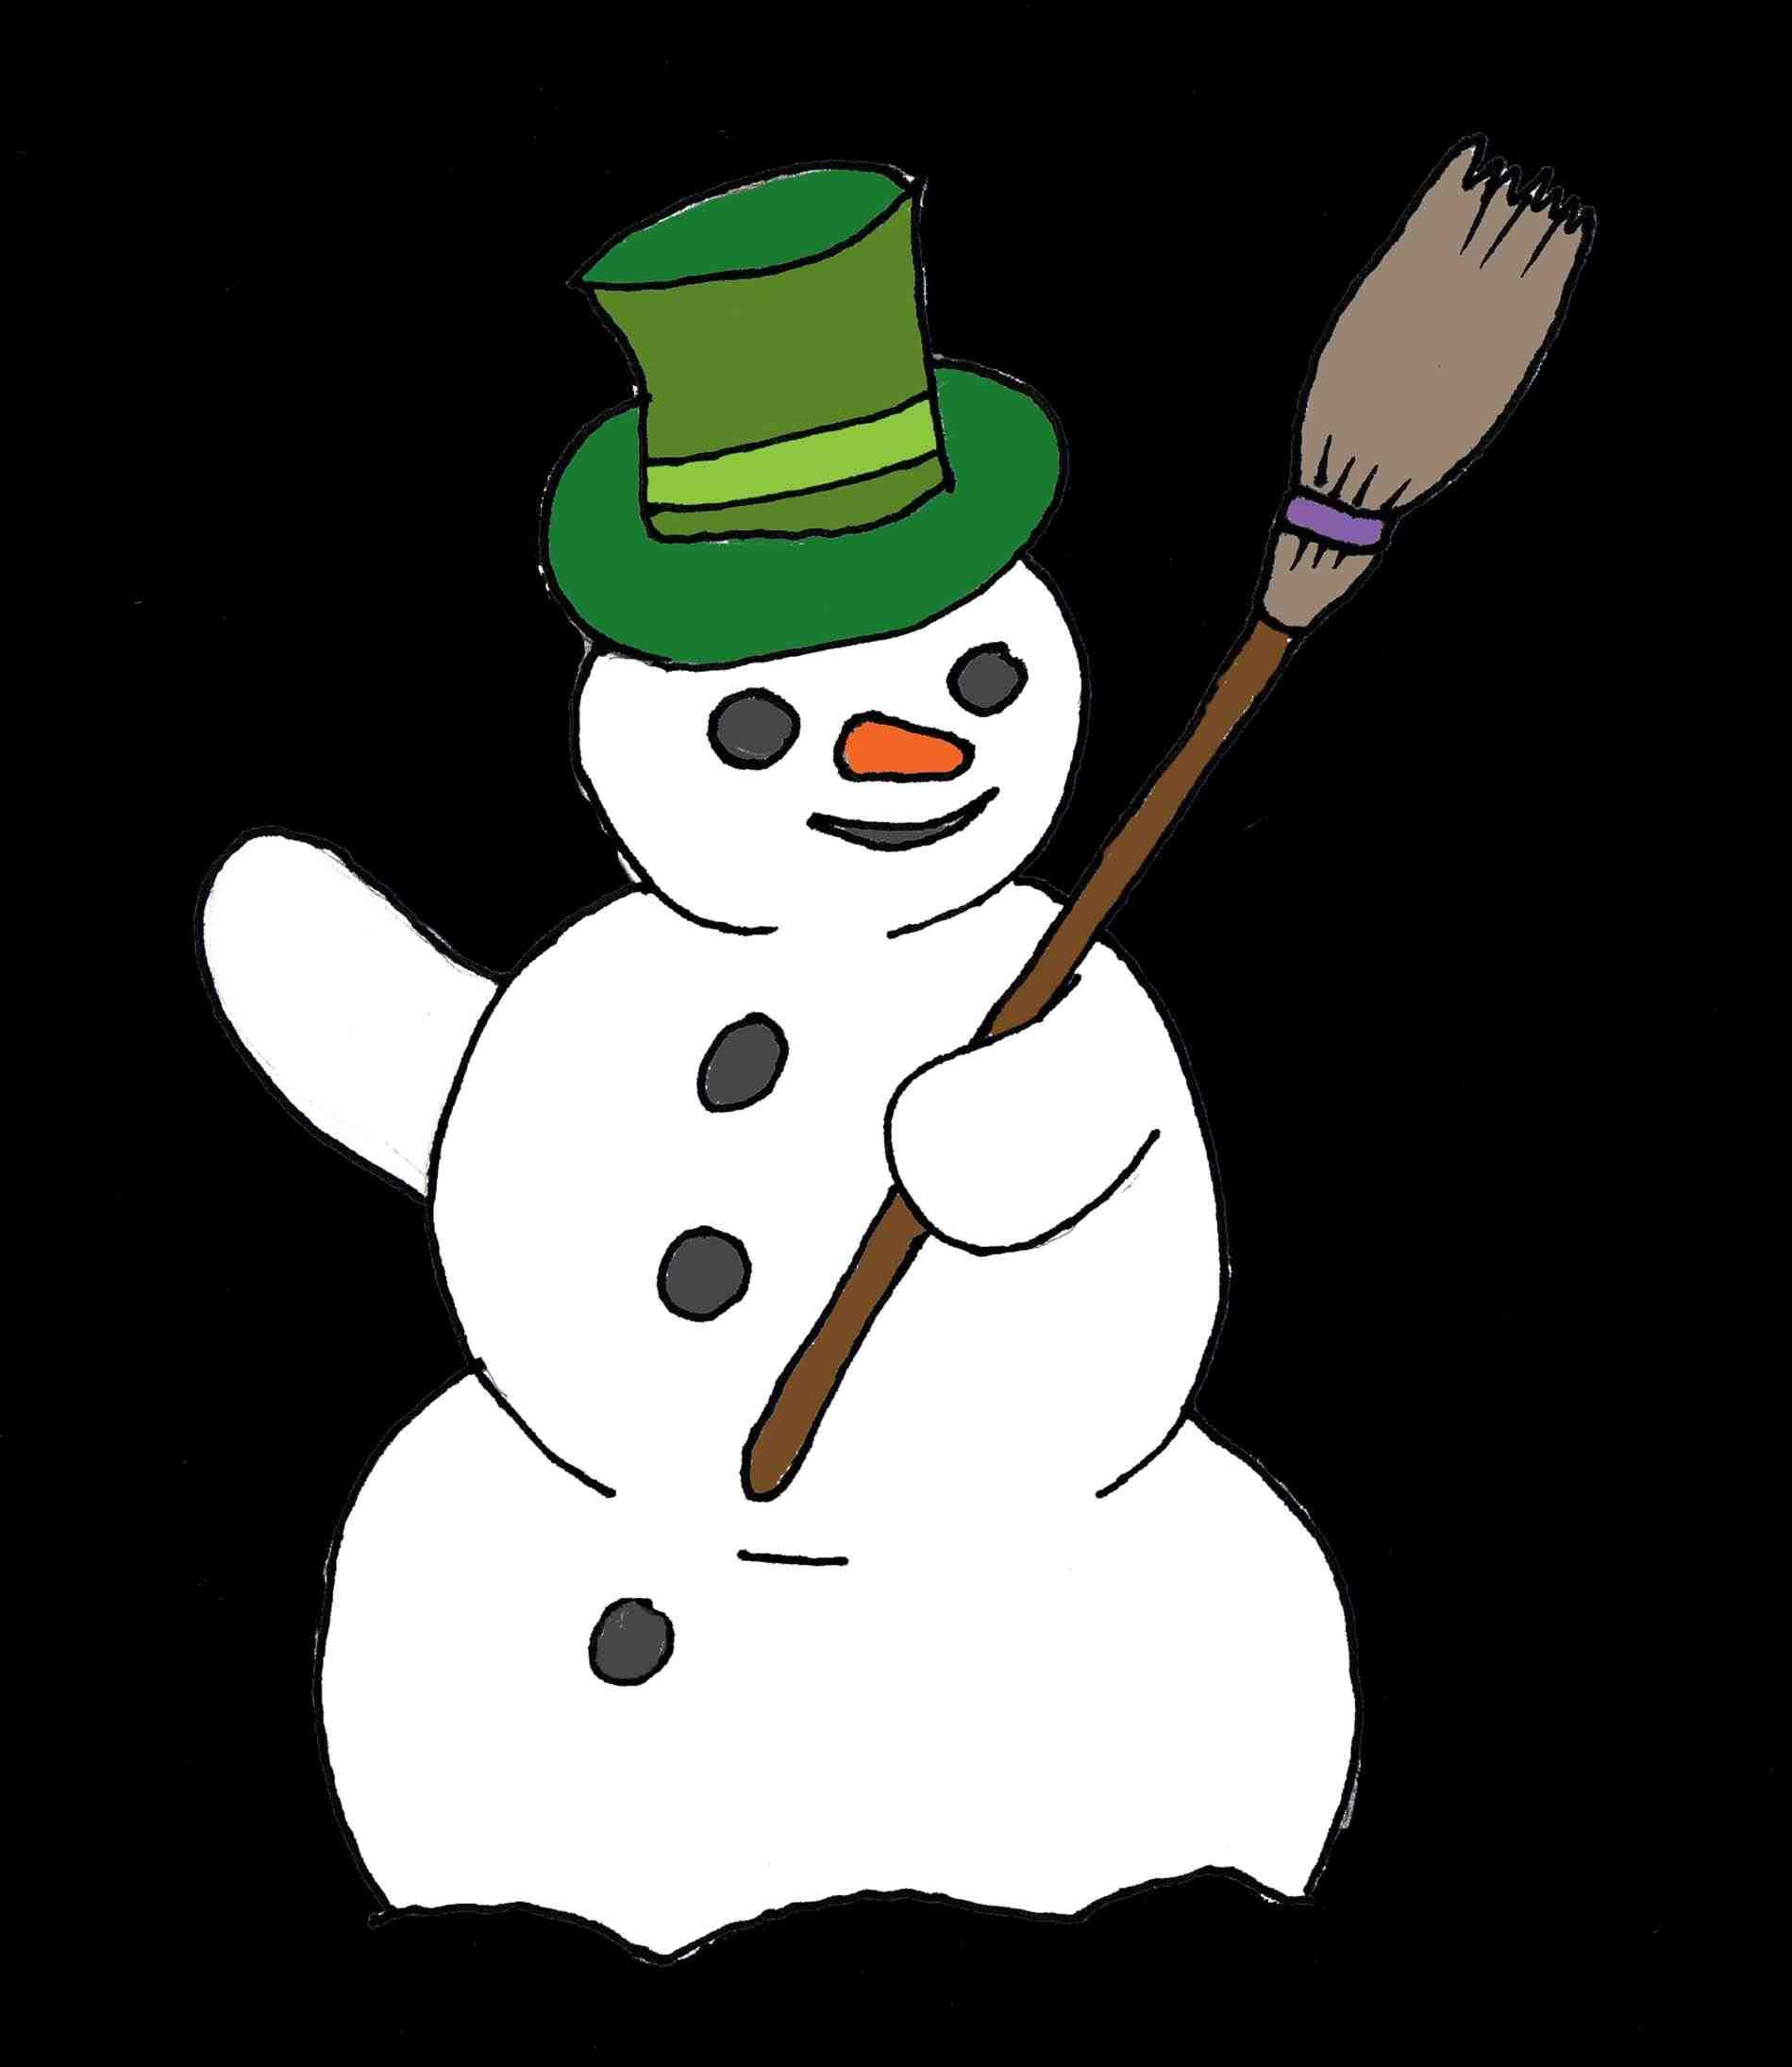 1899x2190 Cute Christmas Snowman Clipart Cheminee.website